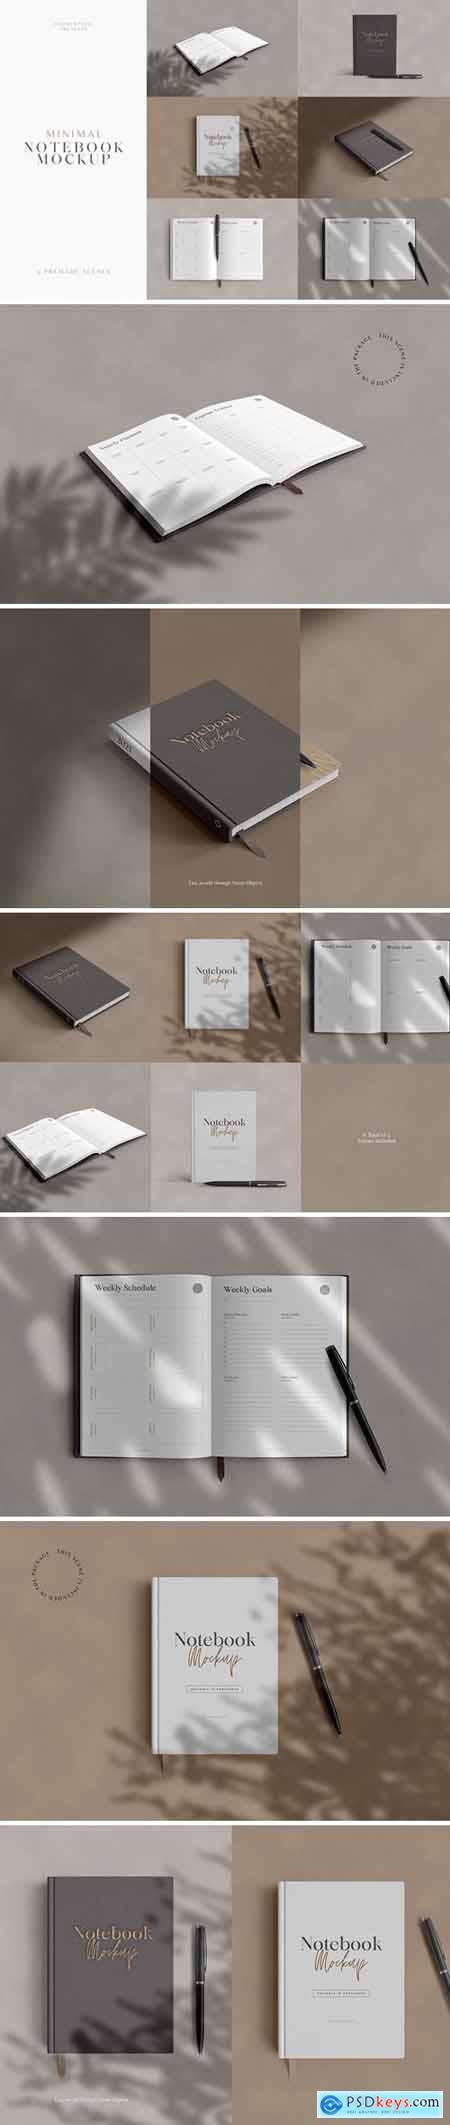 Minimal Notebook Mockups